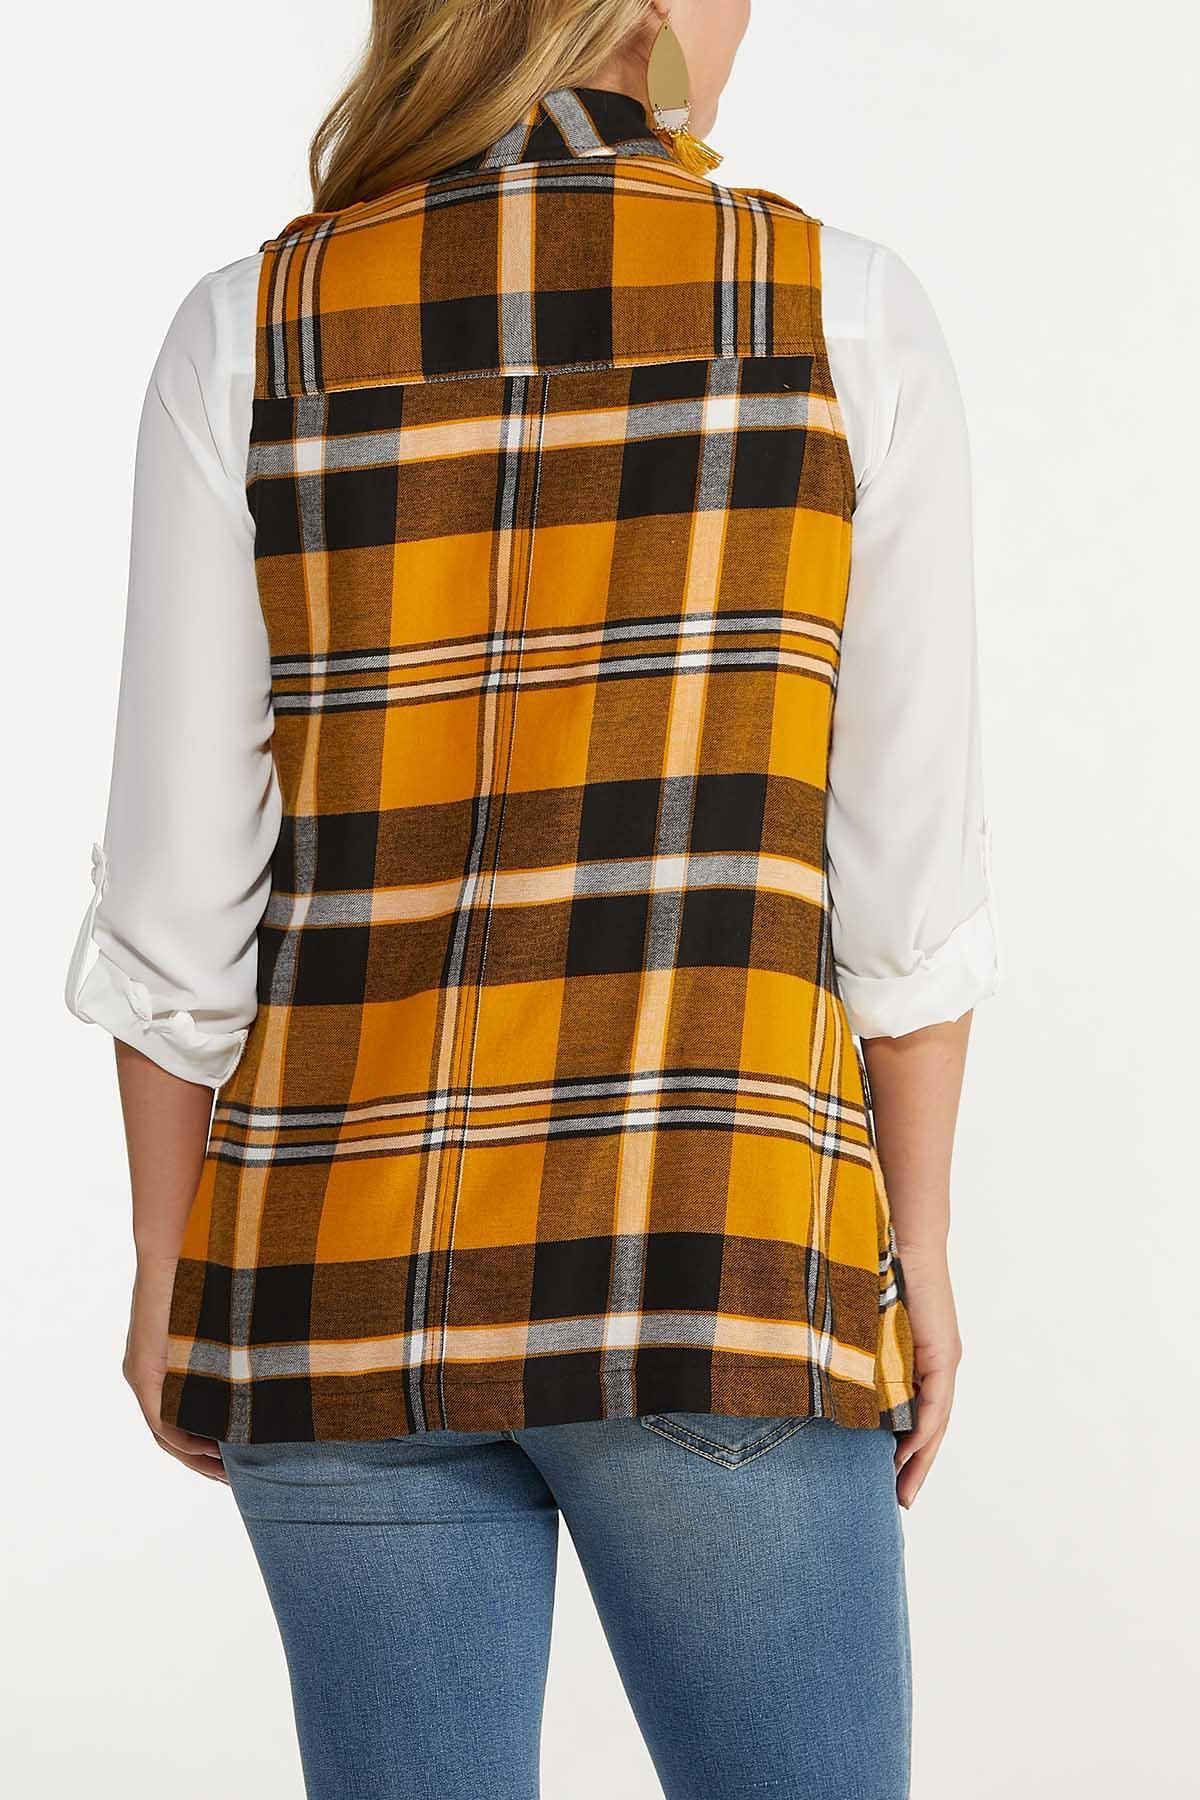 Gold Plaid Vest (Item #44642445)